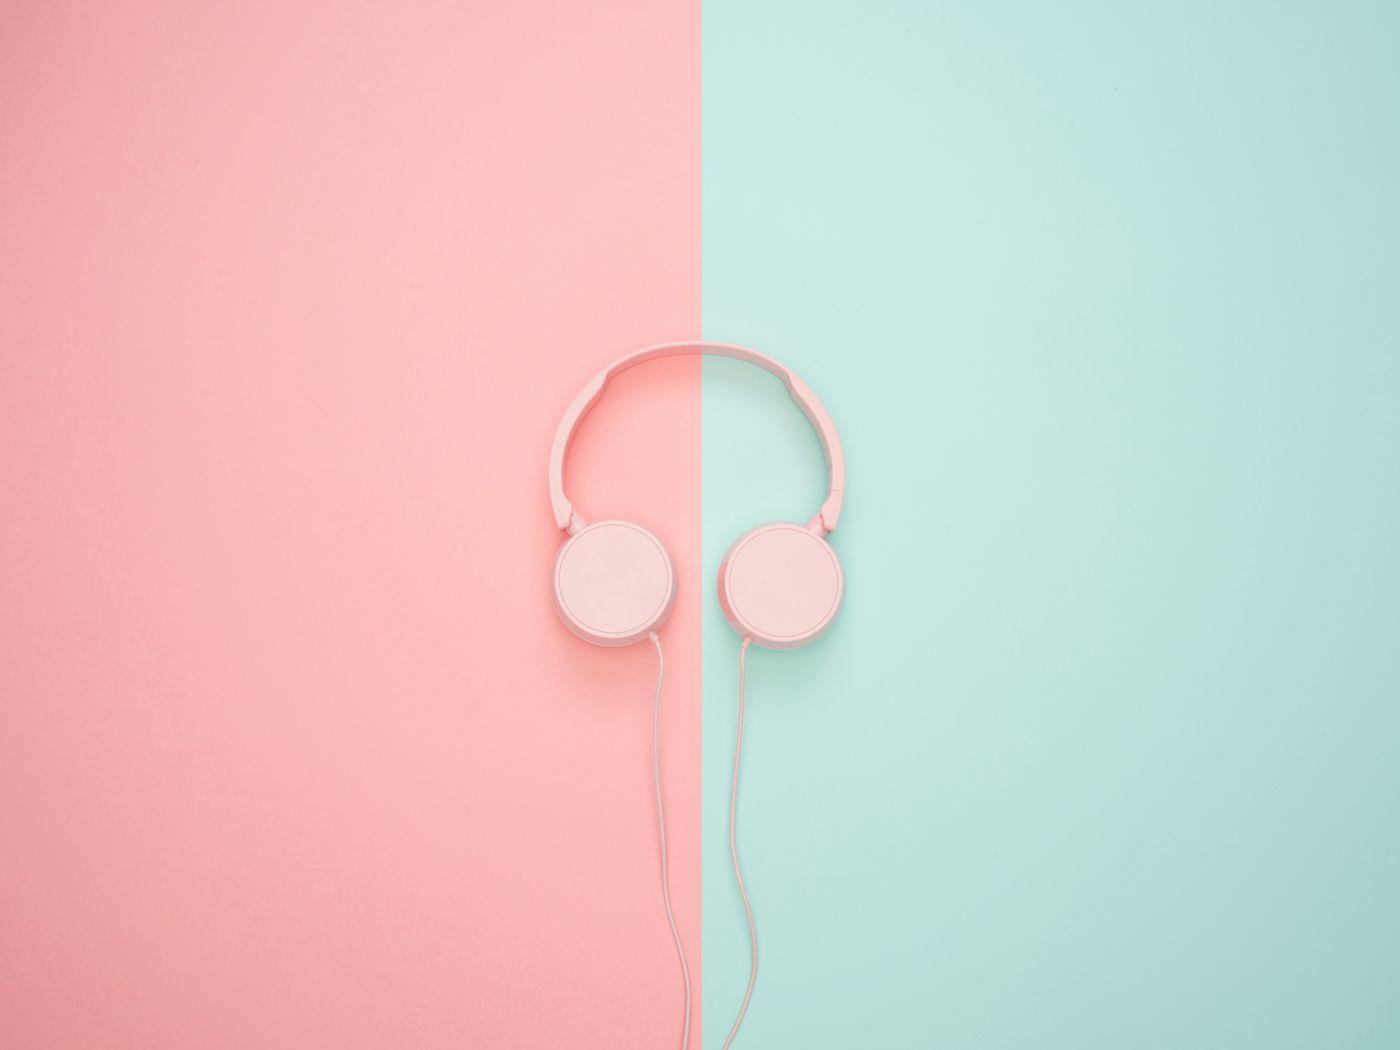 1400x1050 Wallpaper headphones, minimalism, pink, pastel